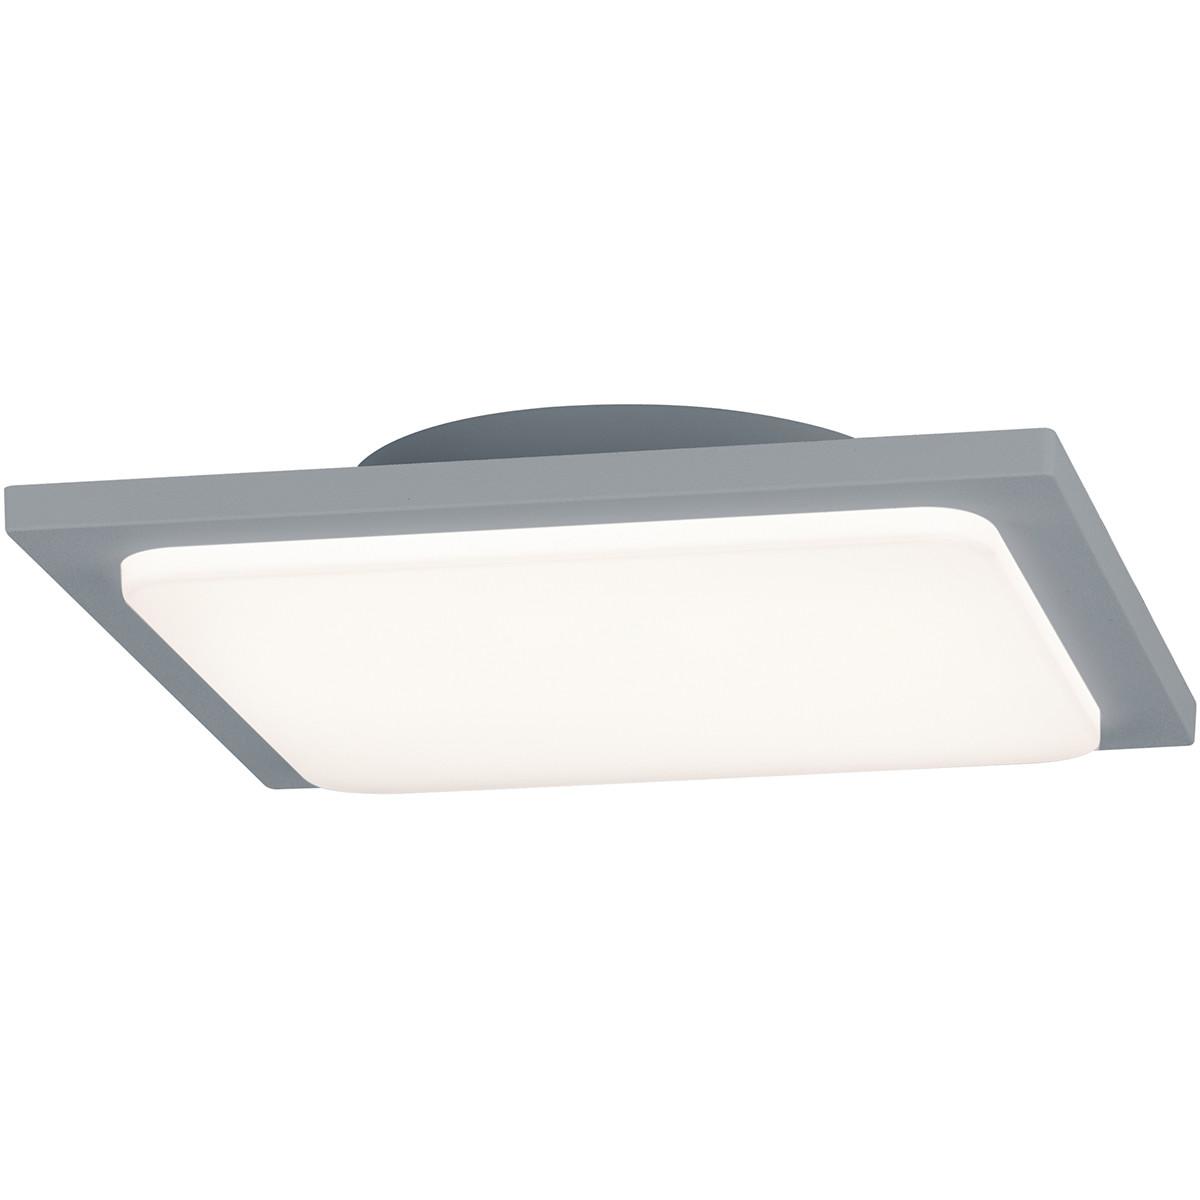 LED Plafondlamp - Trion Tovery - Opbouw Vierkant 18W - Waterdicht IP54 - Warm Wit 3000K - Mat Titaan